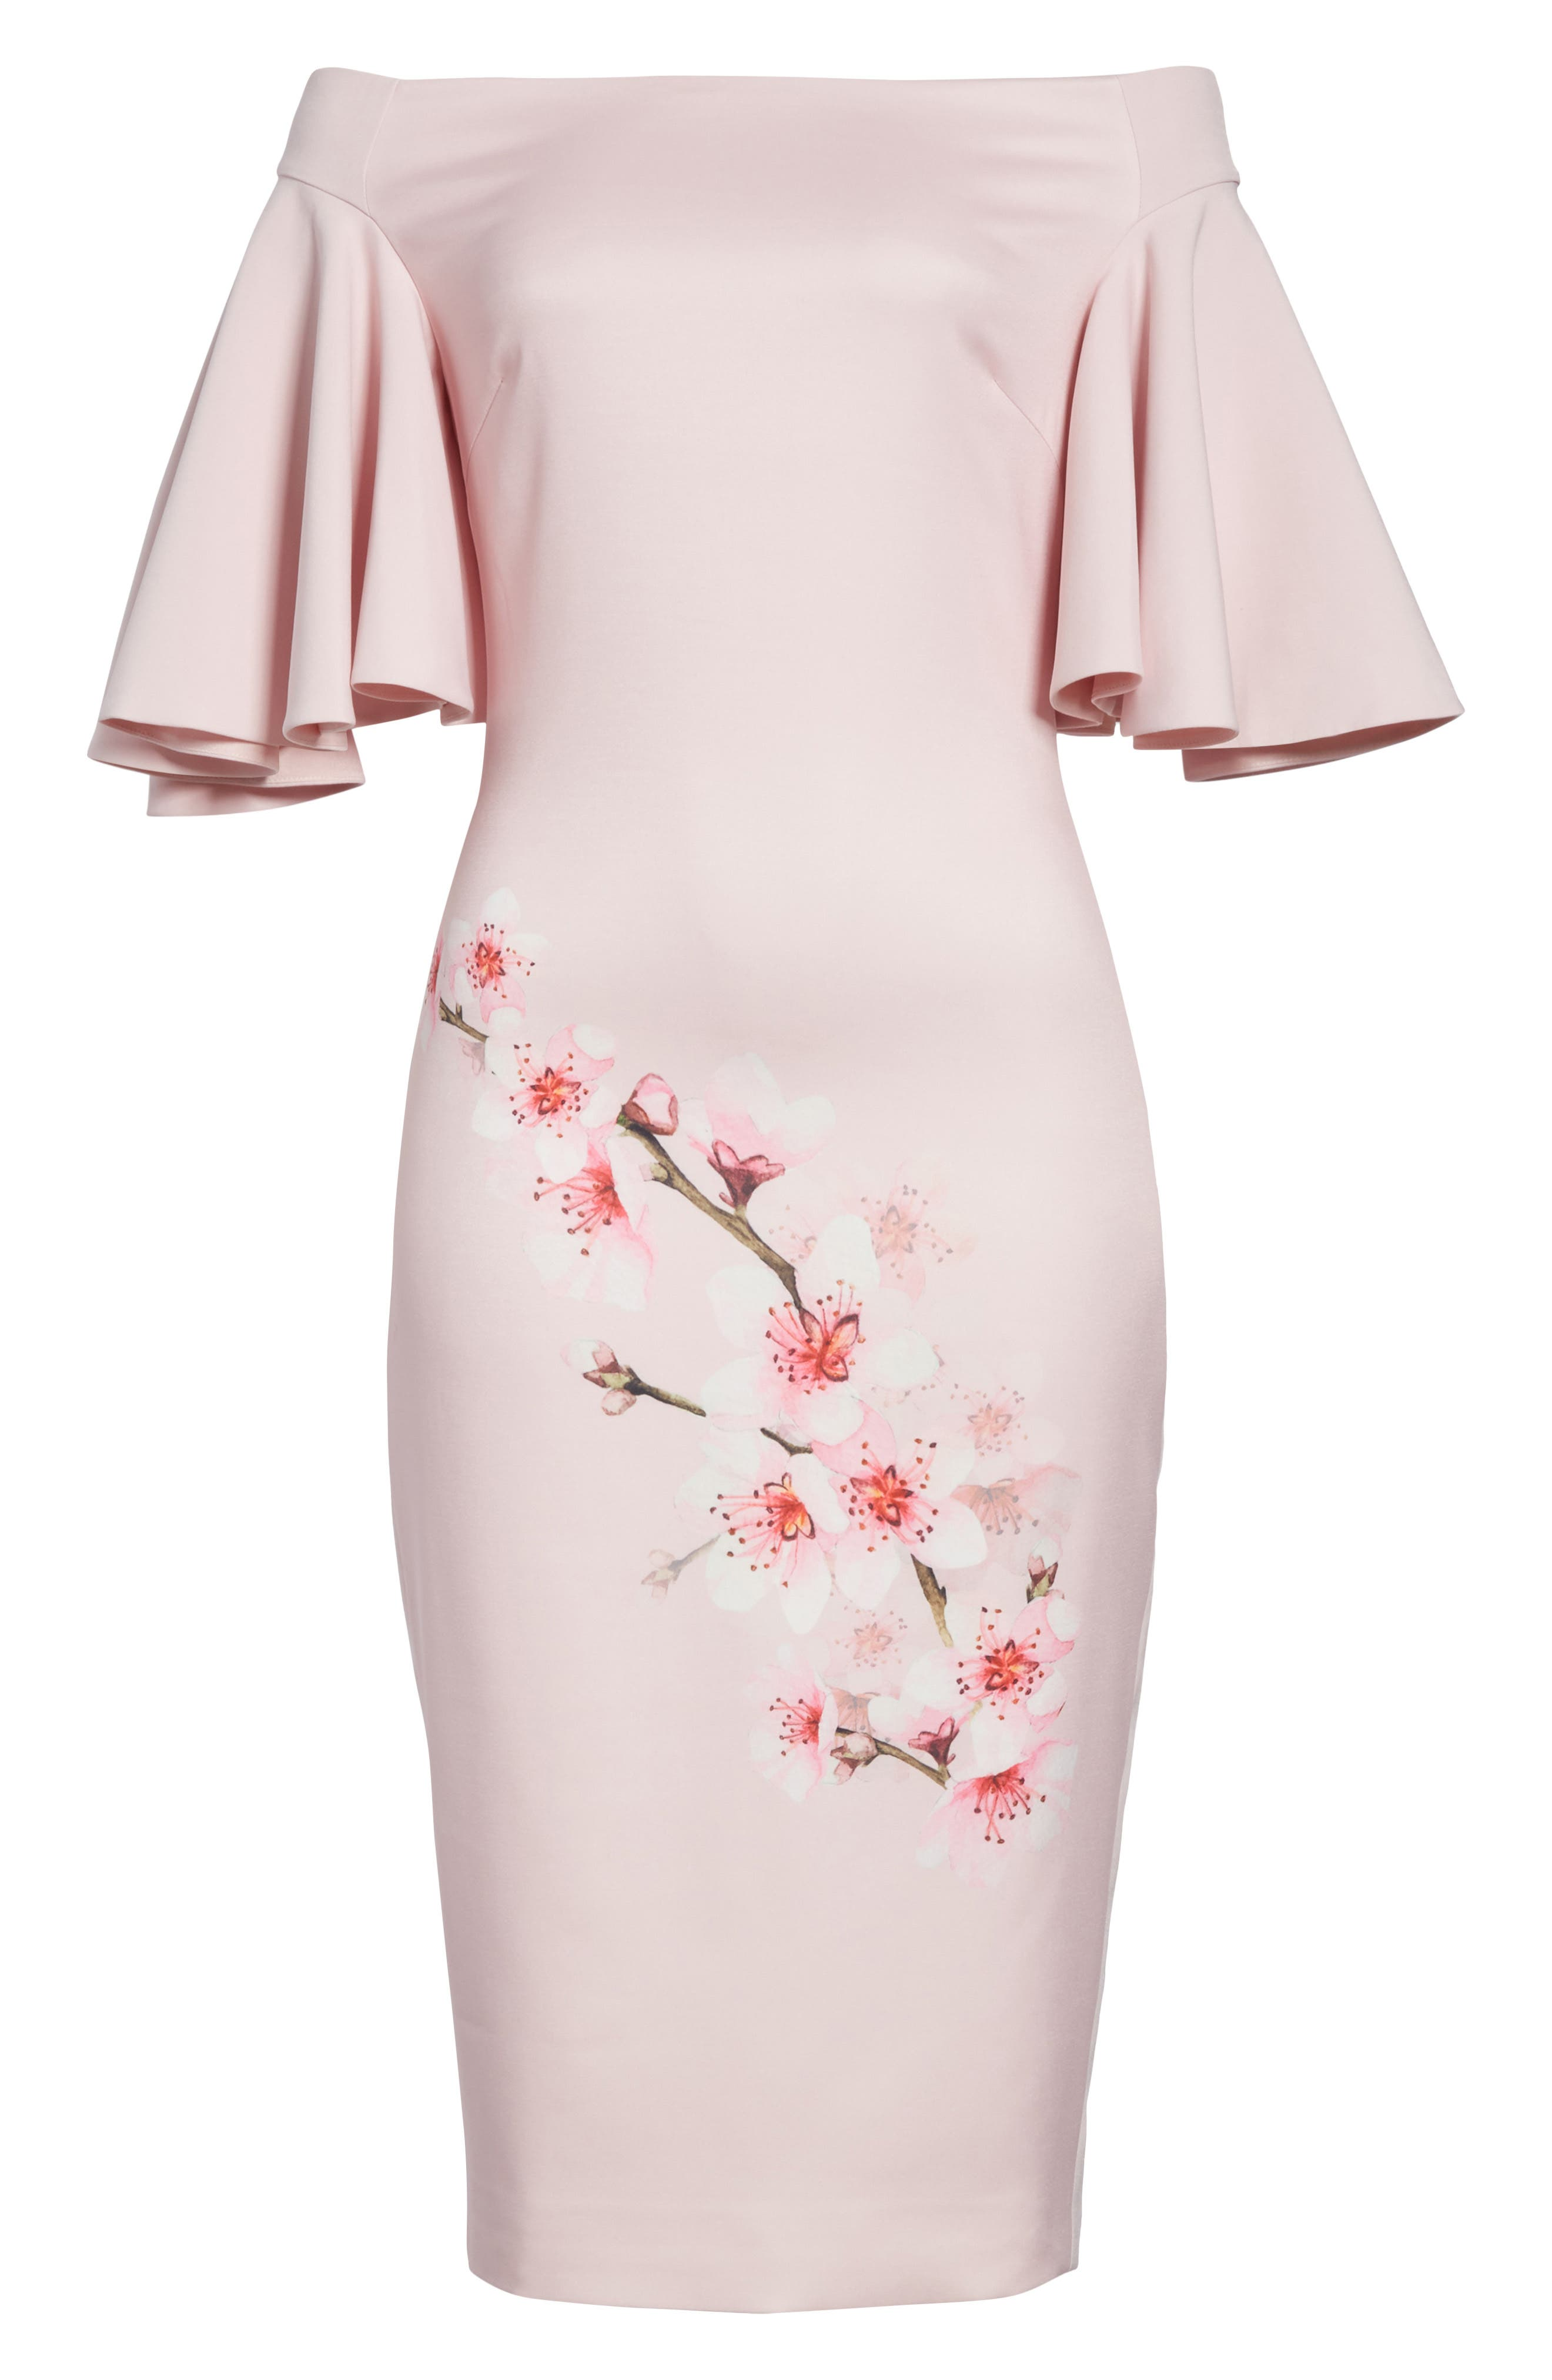 Soft Blossom Off the Shoulder Sheath Dress,                             Alternate thumbnail 6, color,                             683